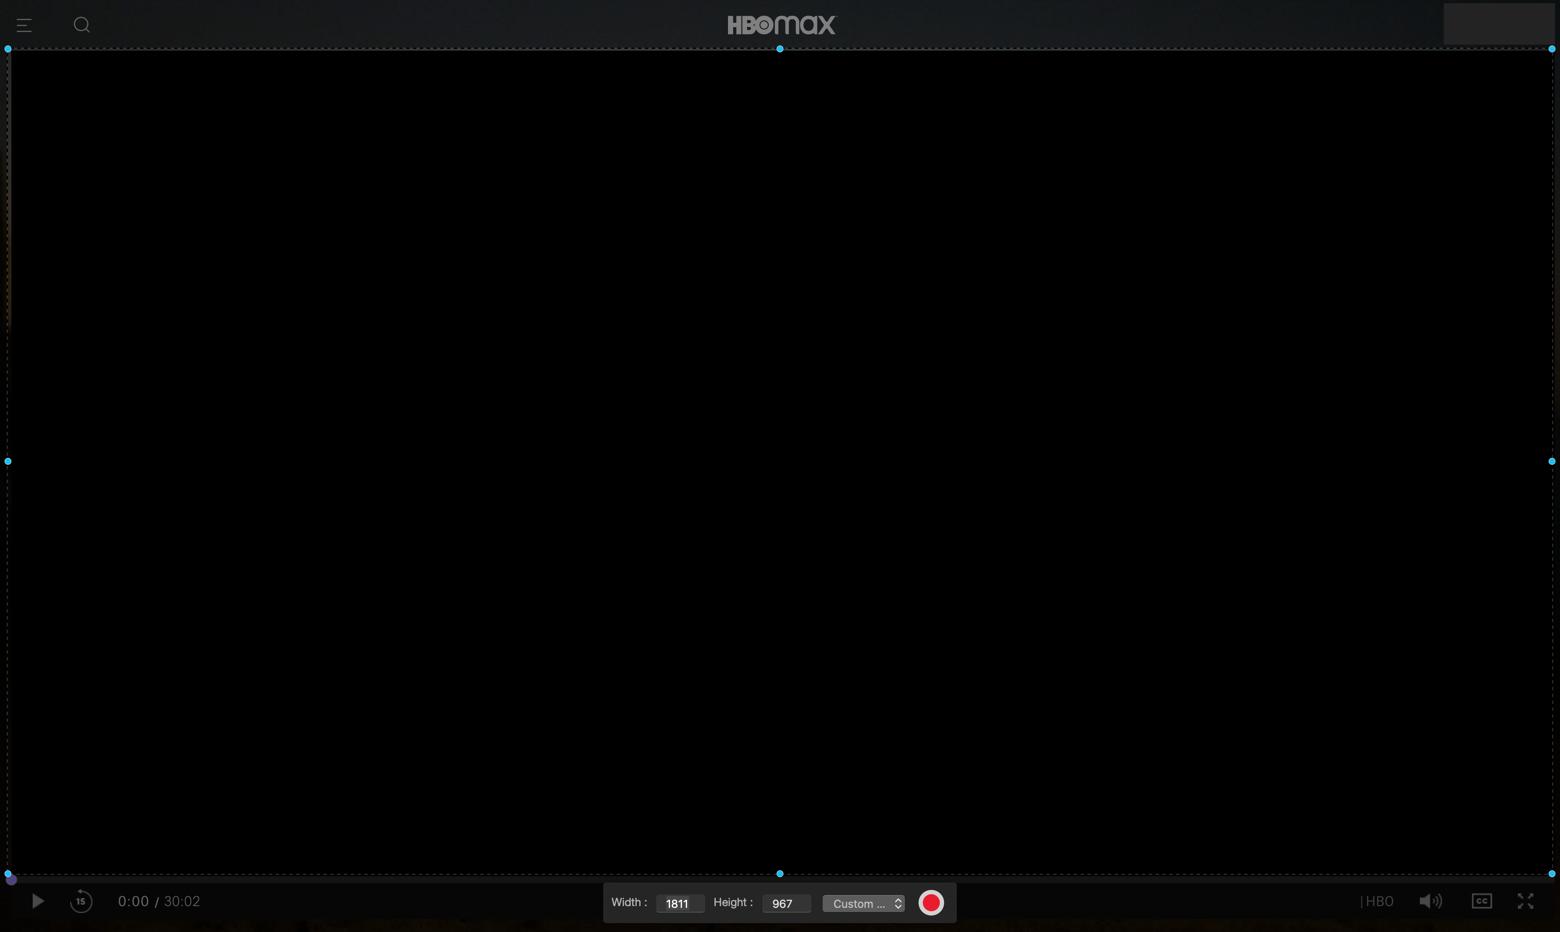 HBO Max recording app